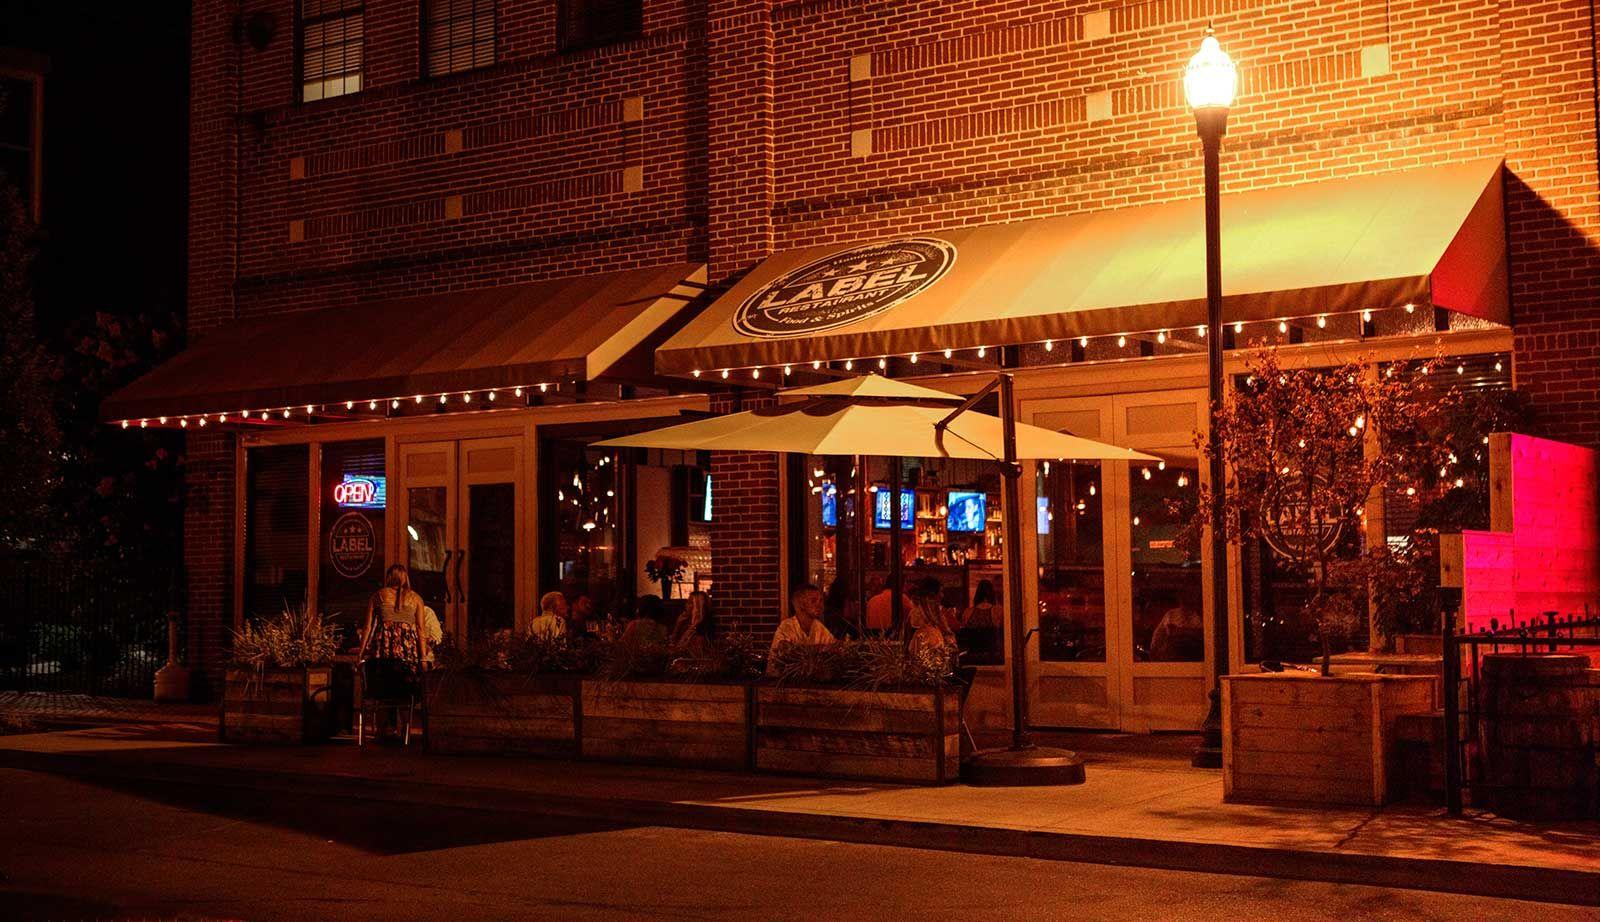 Labelrestaurant Tri Cities Johnson City Dining Experiences